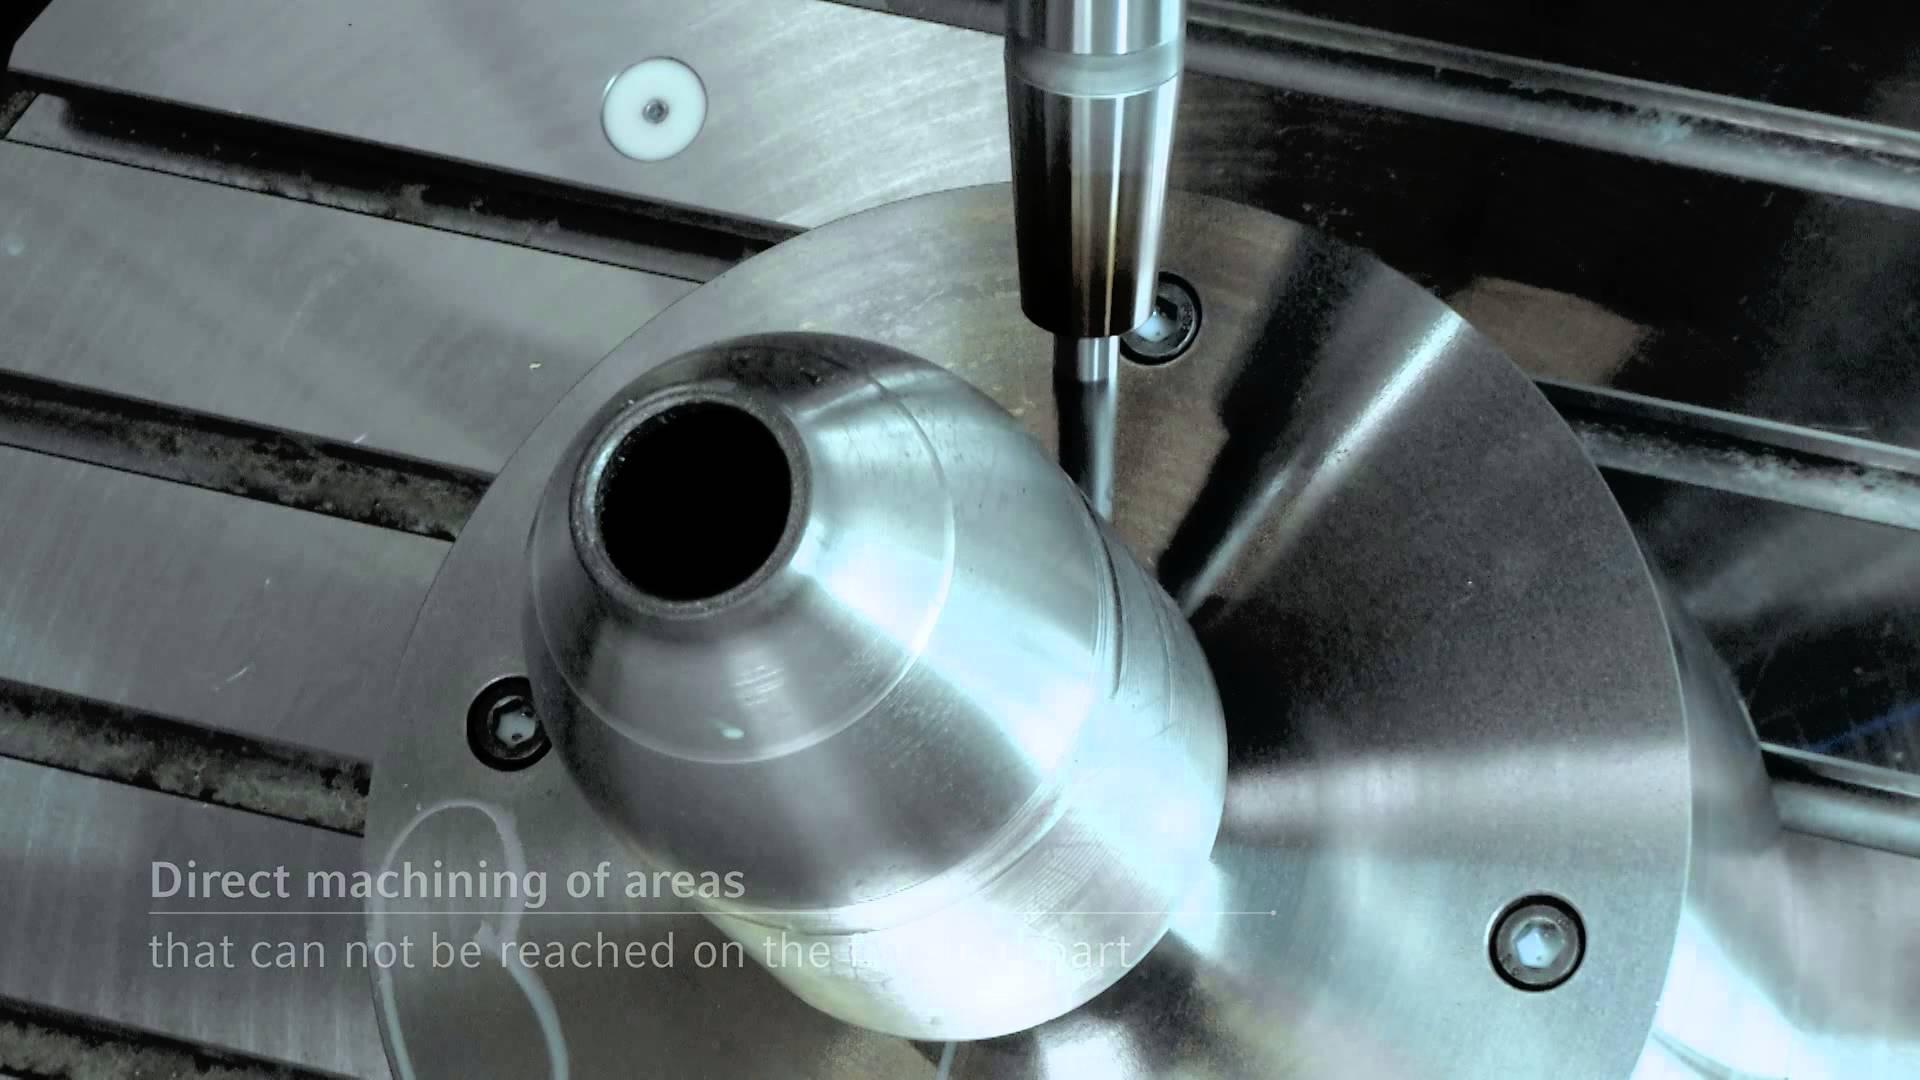 Laser + Welding + 3D Printer